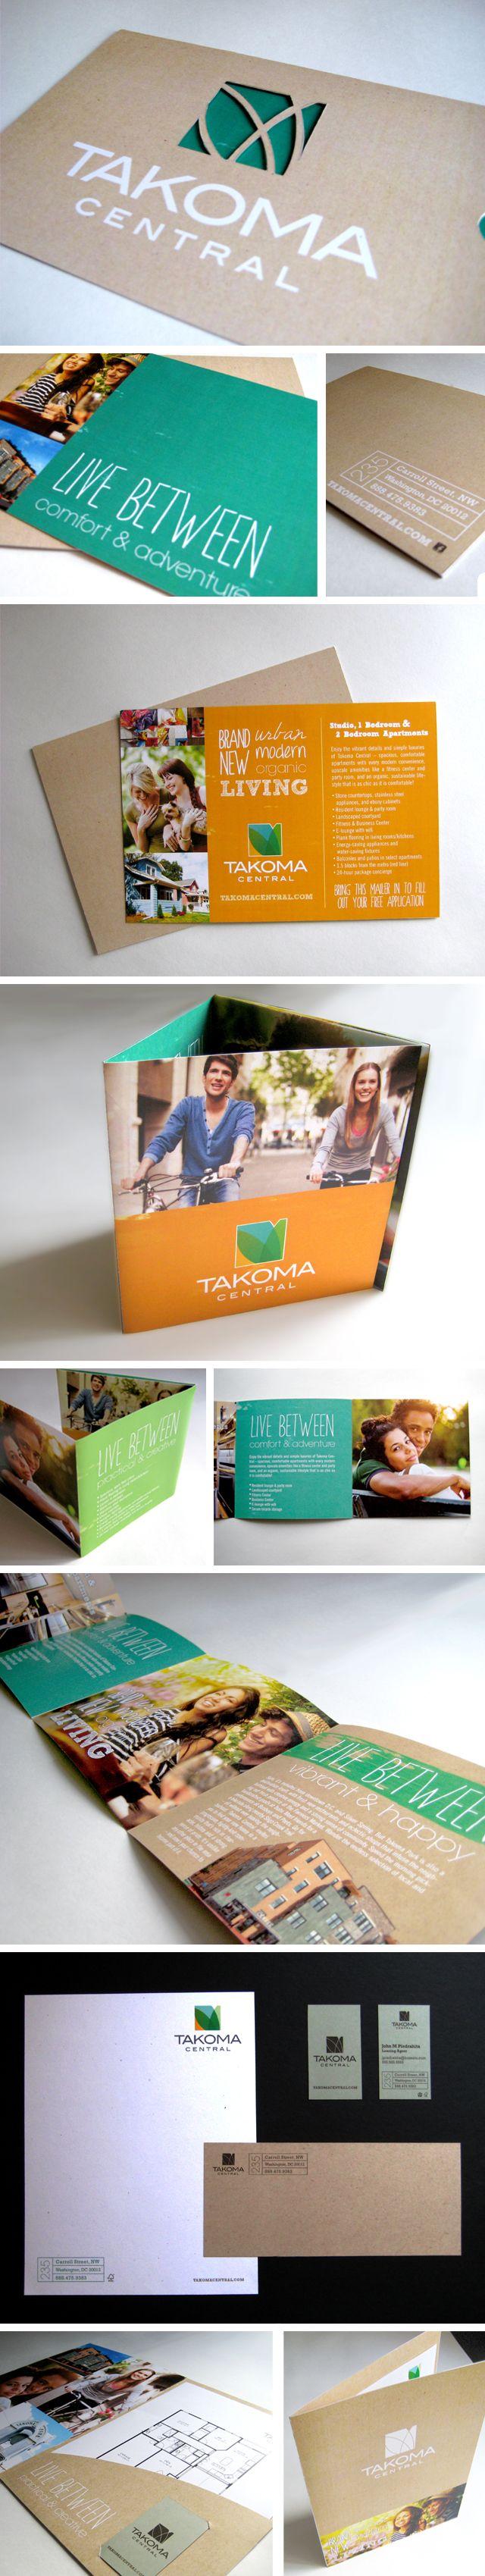 Takoma Central Luxury apartments branding concept - direct mailer, brochure, stationery, pocket folder - The Joyful Creative